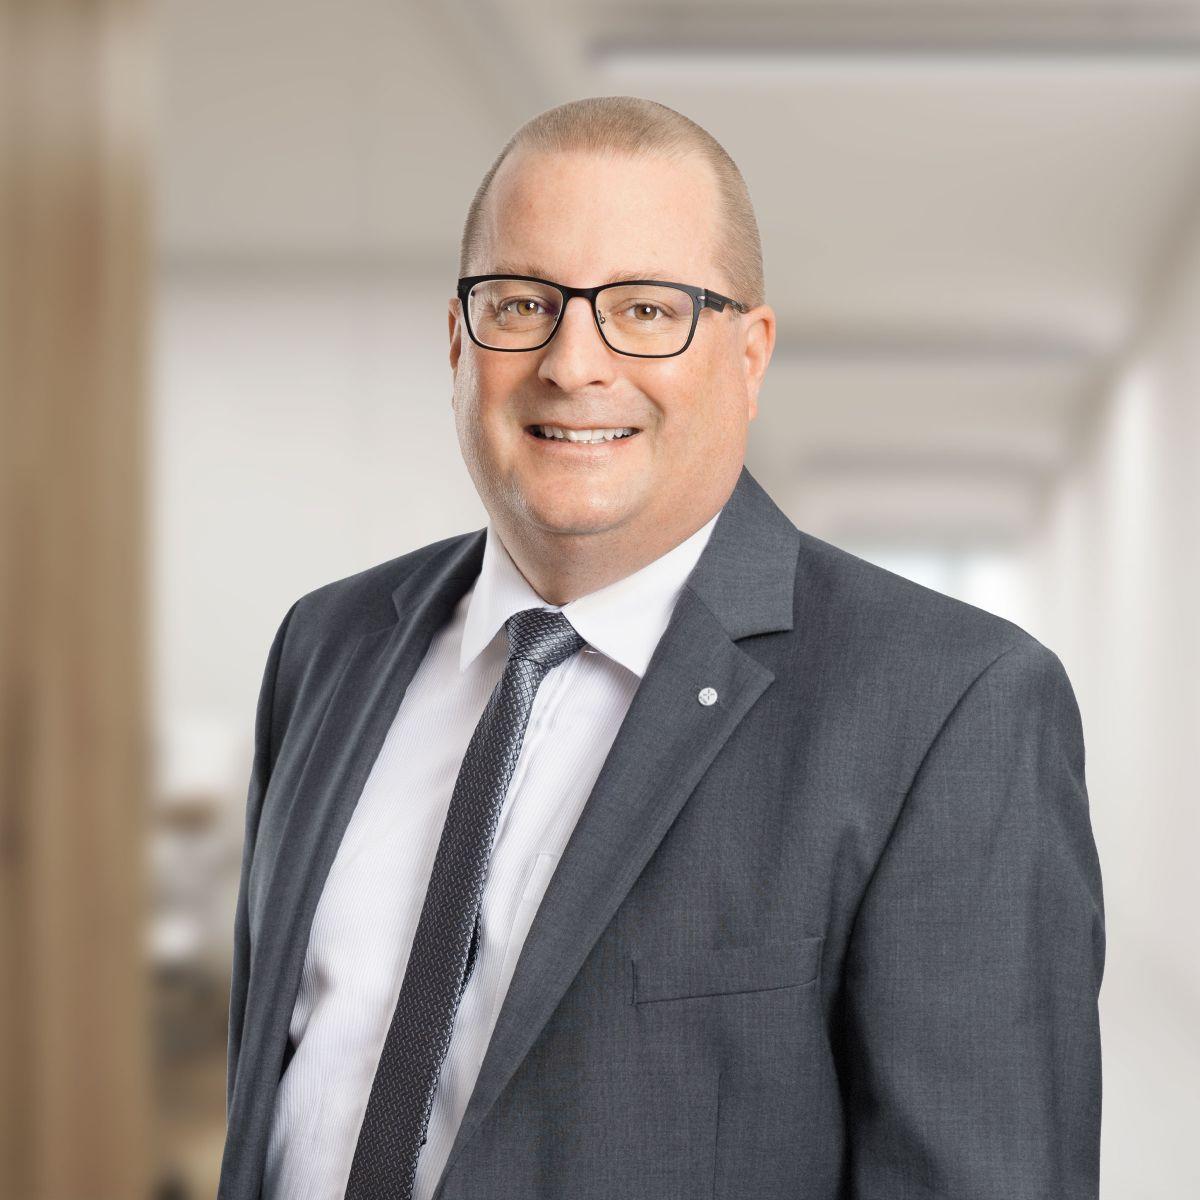 Niklaus Mürner